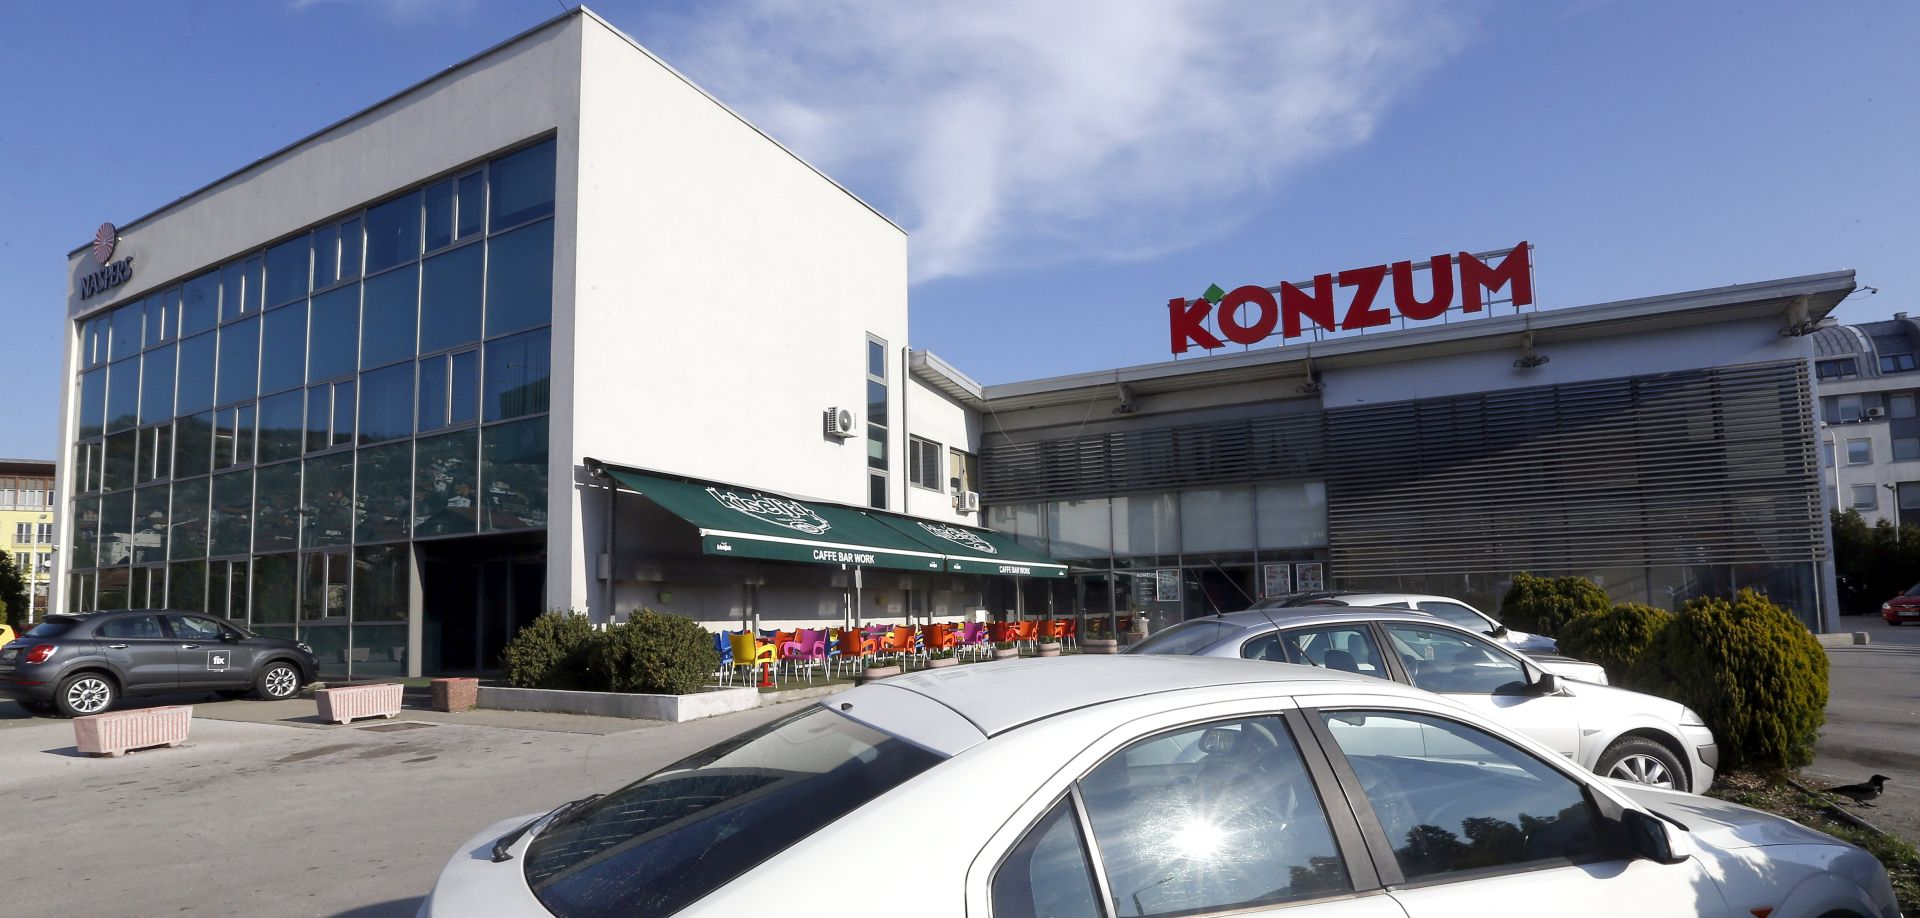 Opljačkan bankomat u Super Konzumu u Španskom